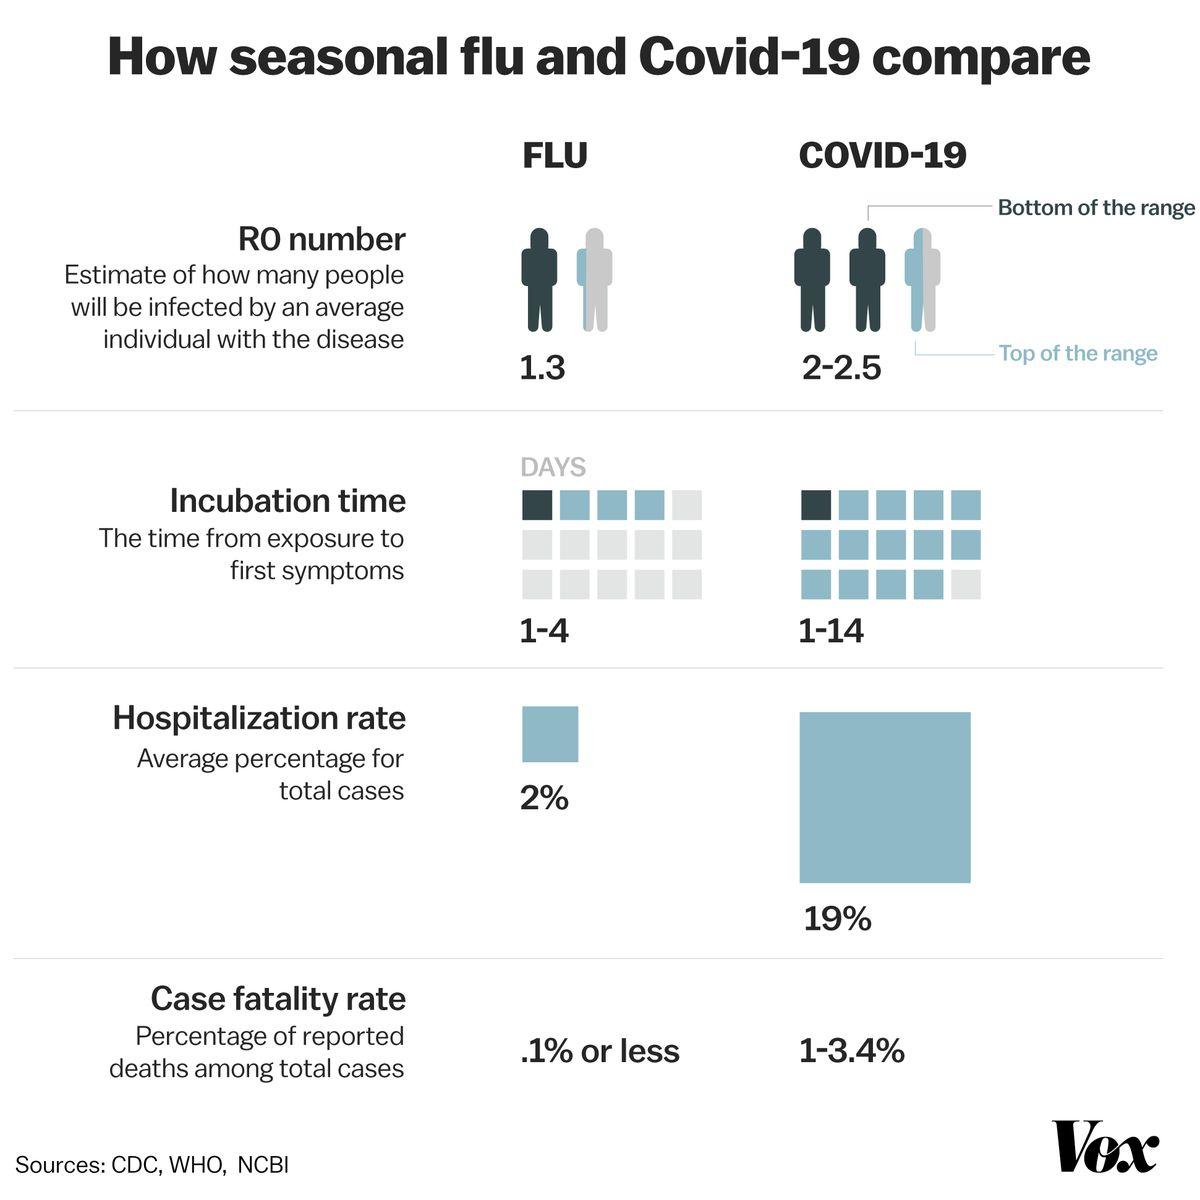 Coronavirus From America: Why The Covid-19 Coronavirus Is Worse Than The Flu, In One